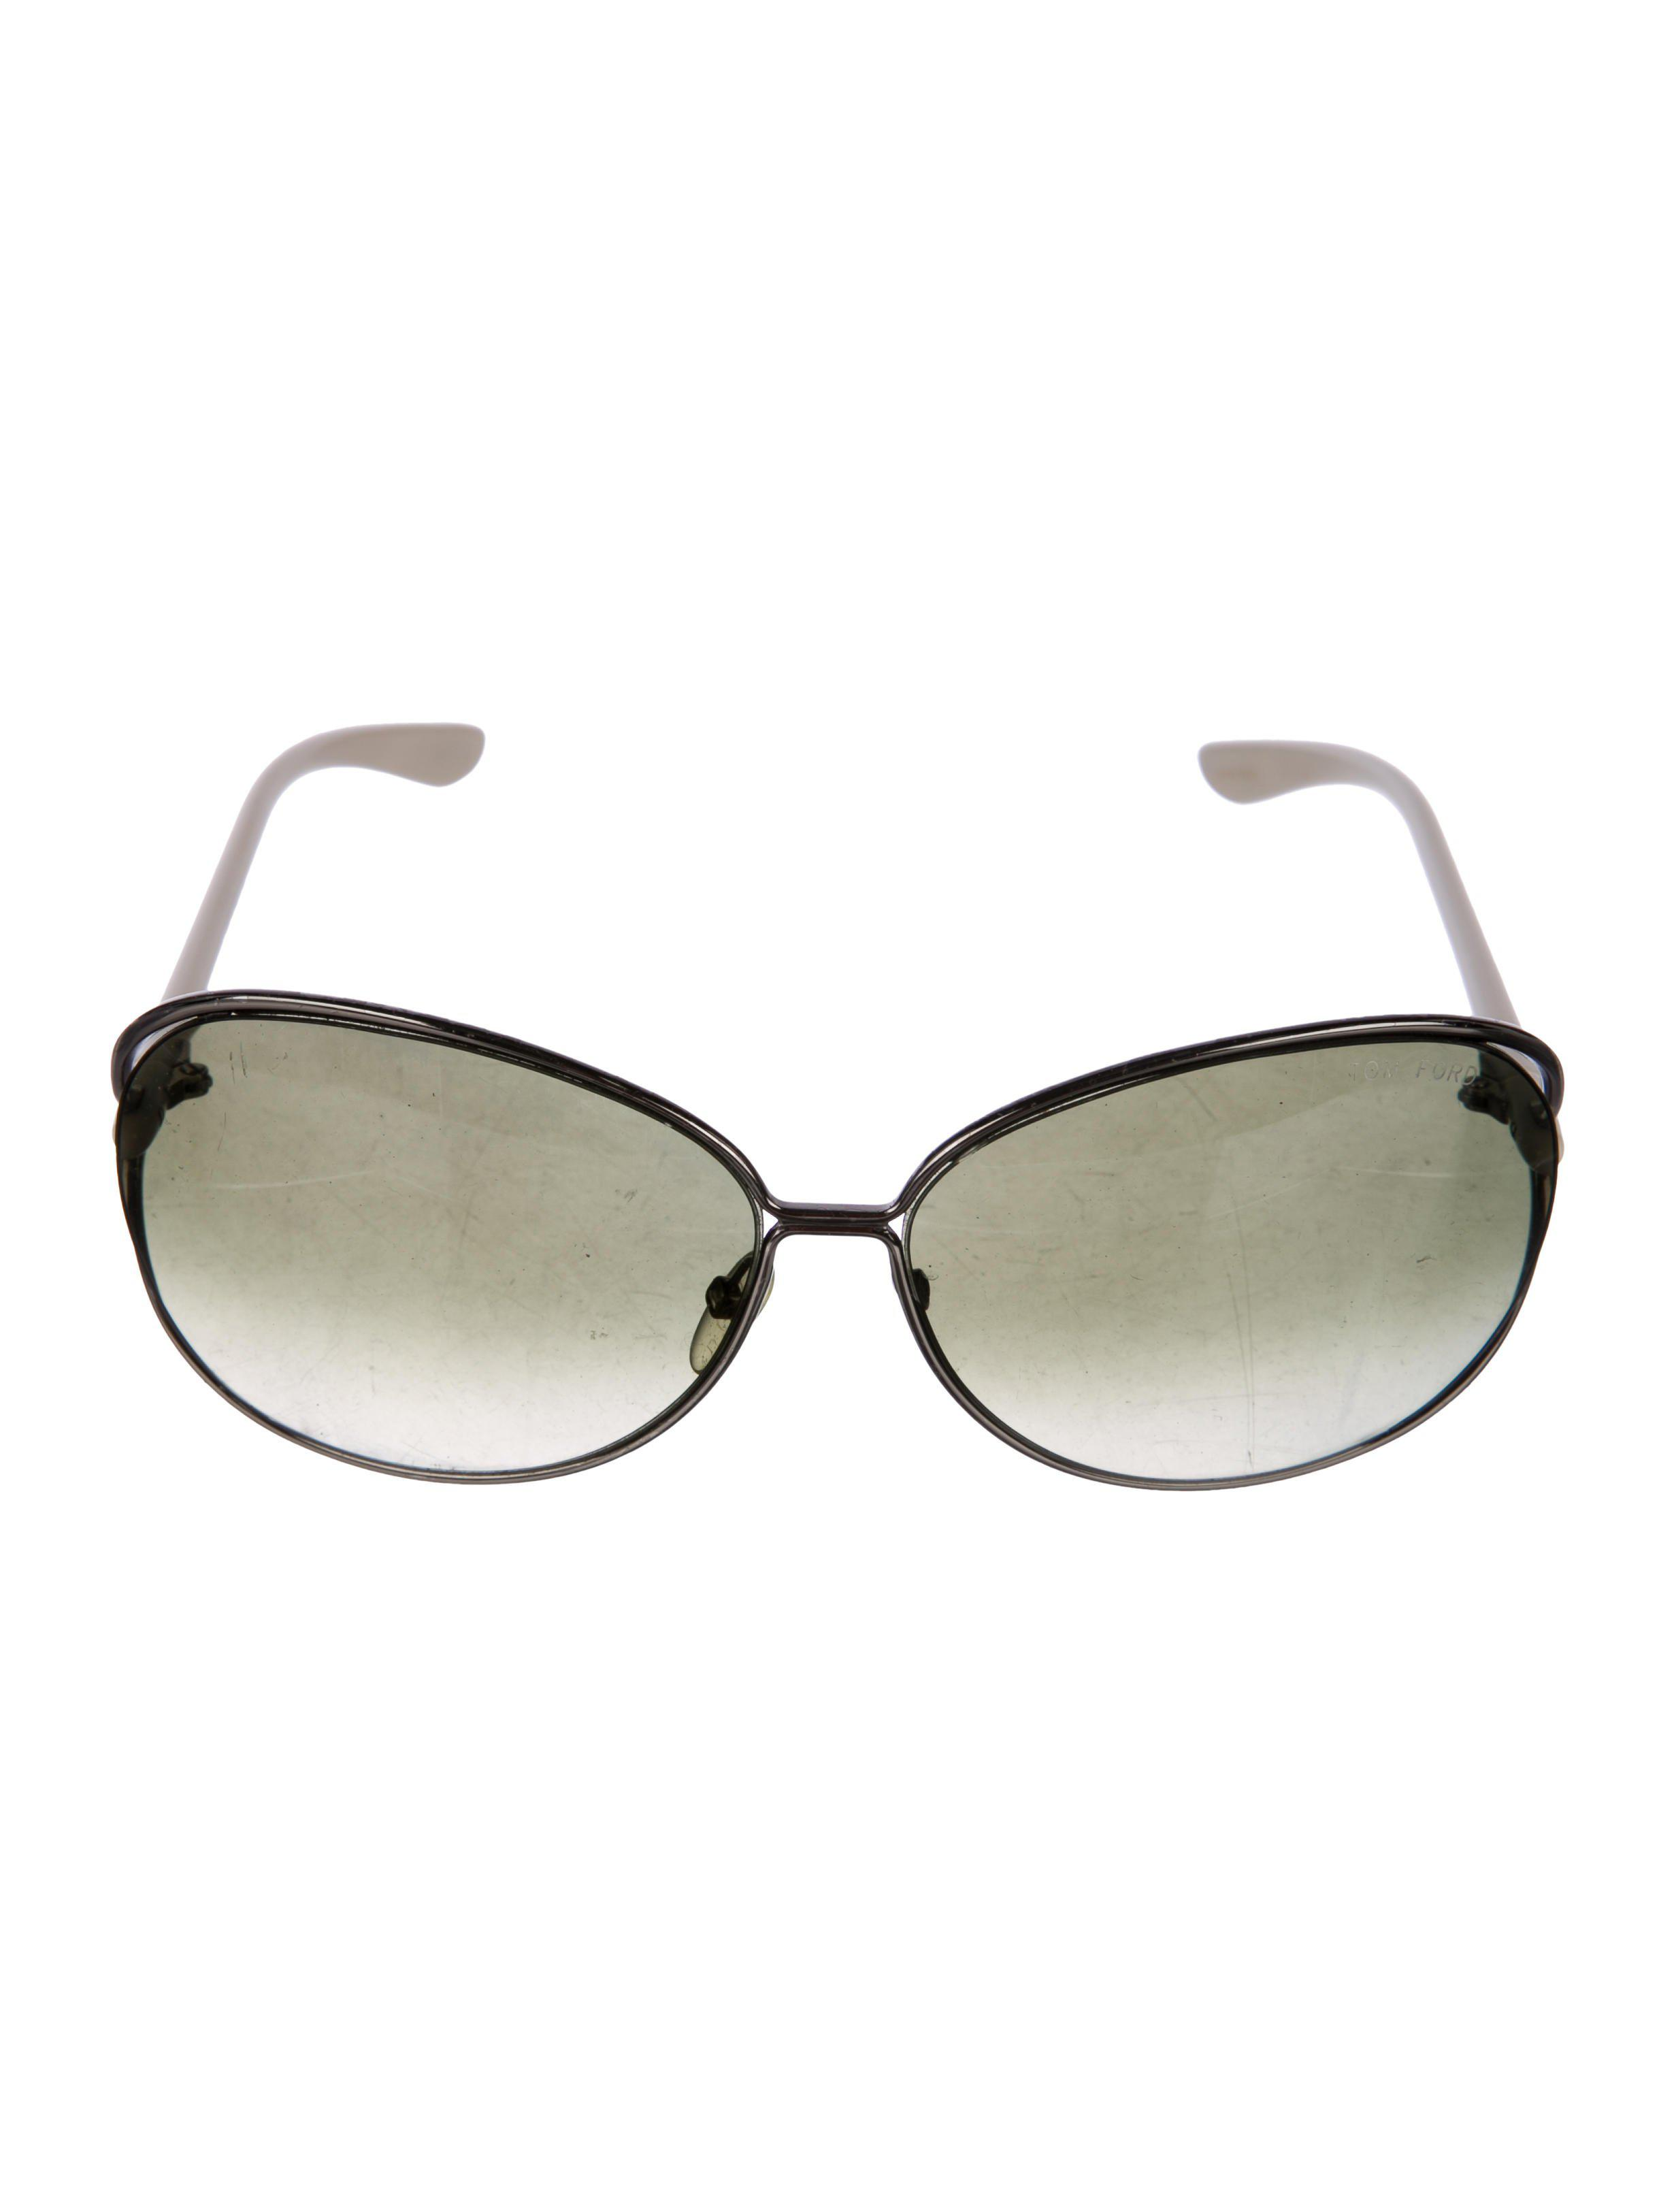 cd233f44ece8 Tom Ford - Natural Clémence Oversize Sunglasses Neutrals - Lyst. View  fullscreen